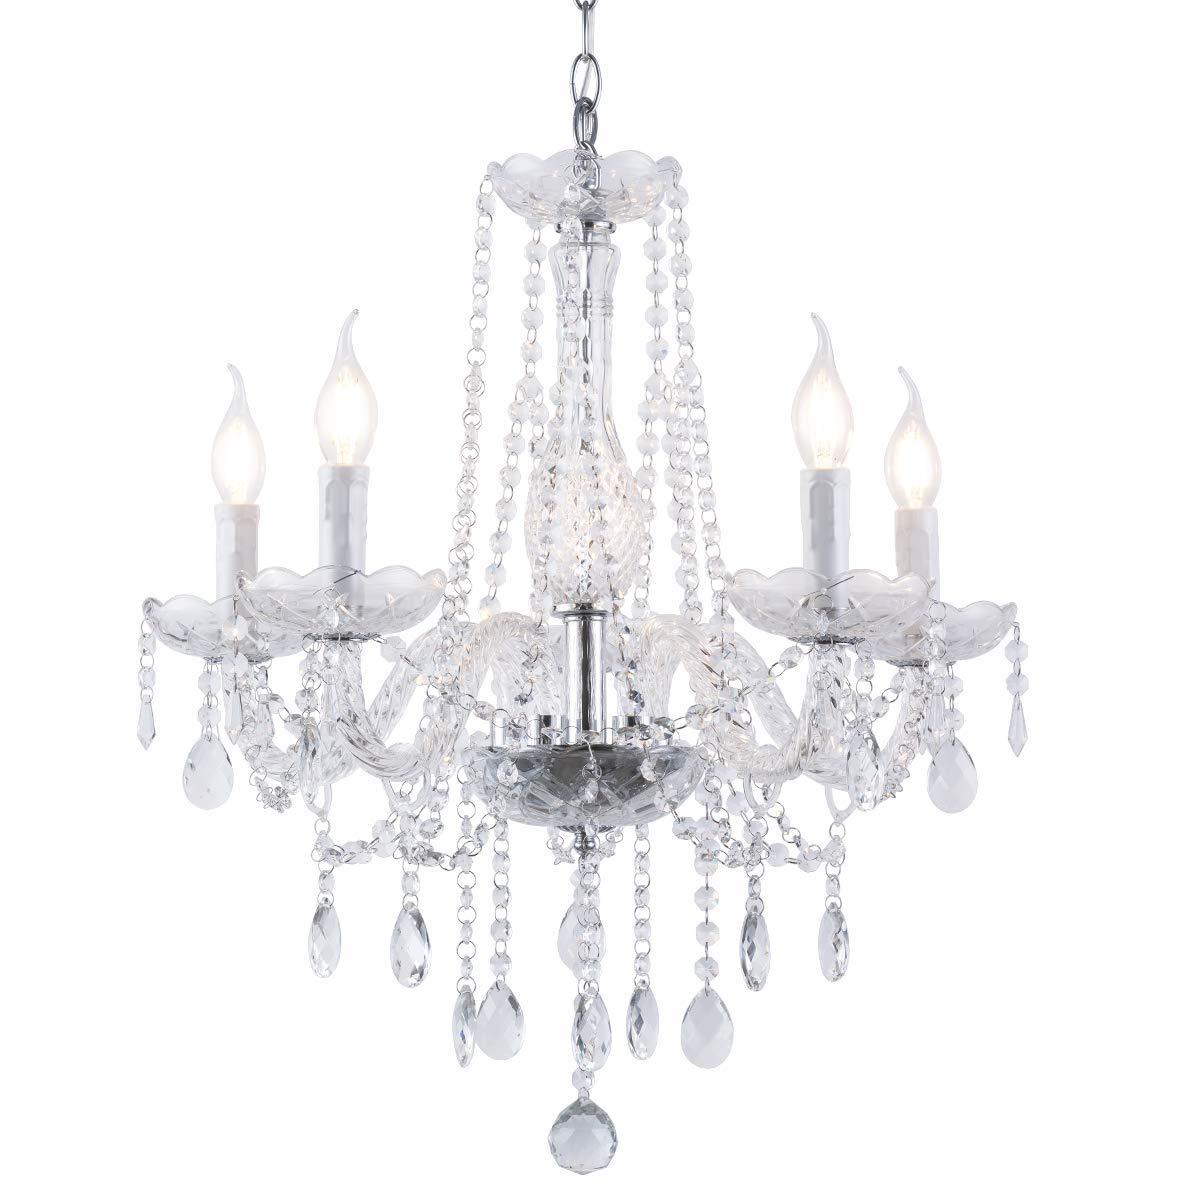 Riomasee Crystal Chandelier Modern Elegant Decoration K9 Crystal Candle Ceiling Light Hanging Fixture for Living Room, Dining Room, Bedroom, Hotel 5-Light W22.44 x H22.44